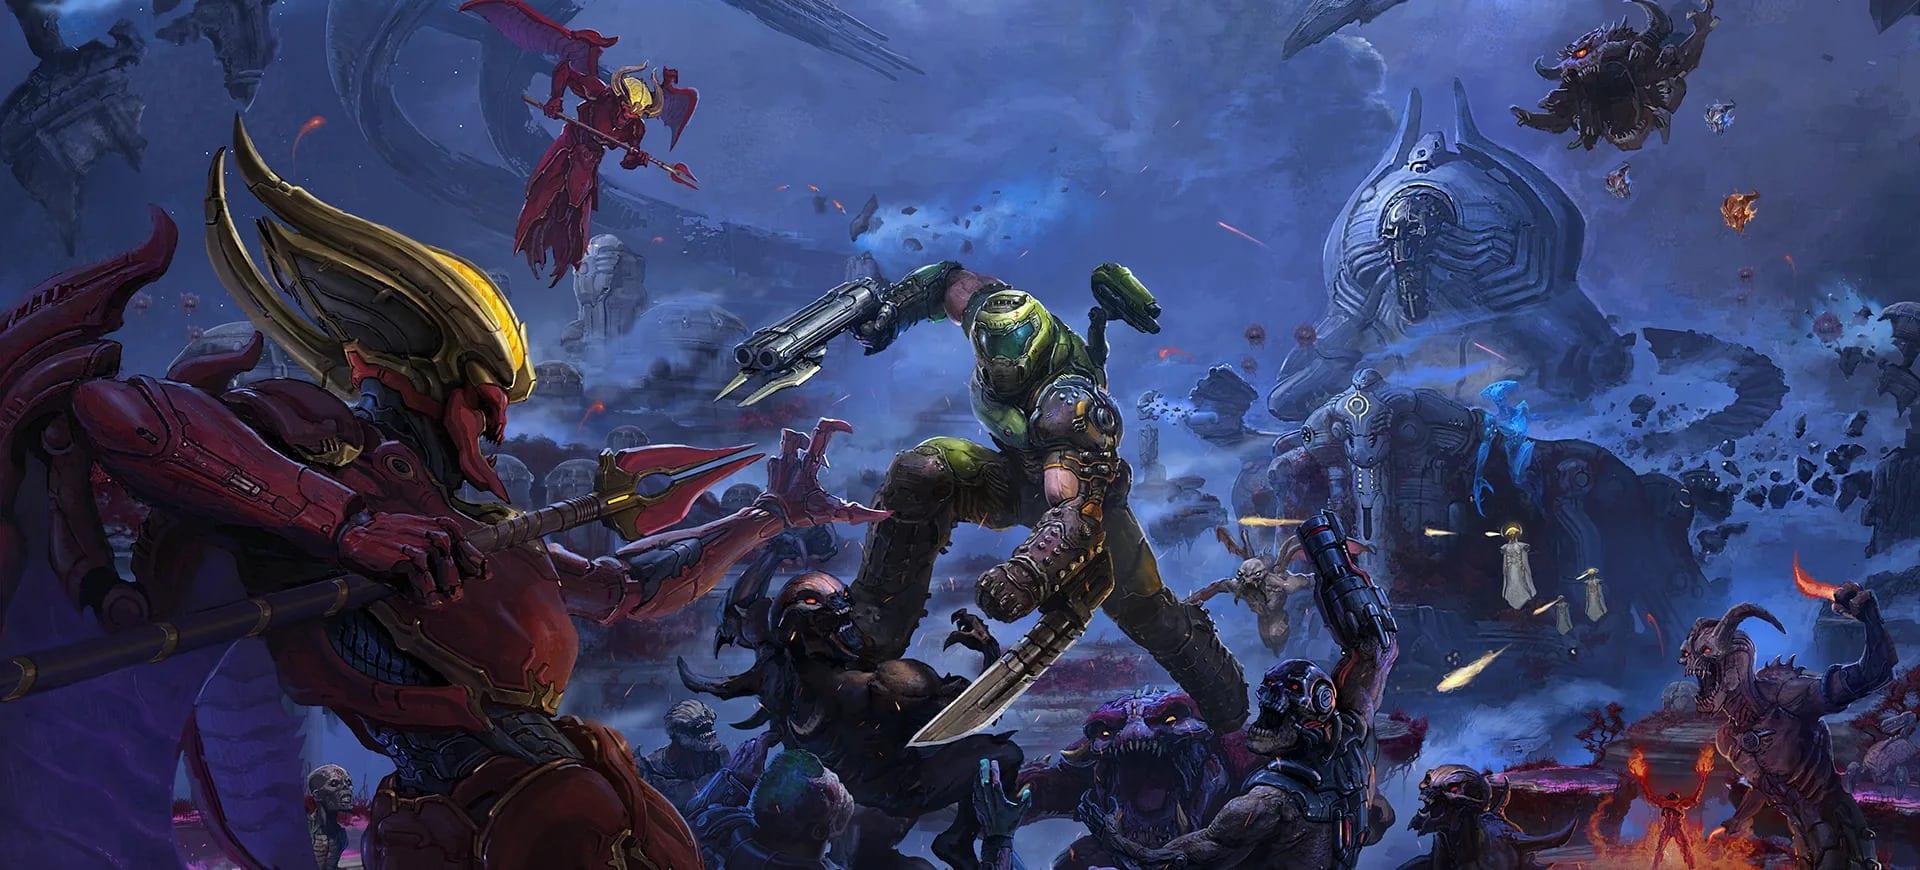 Doom Eternal: The Ancient Gods - Part 1 sarà disponibile a ottobre